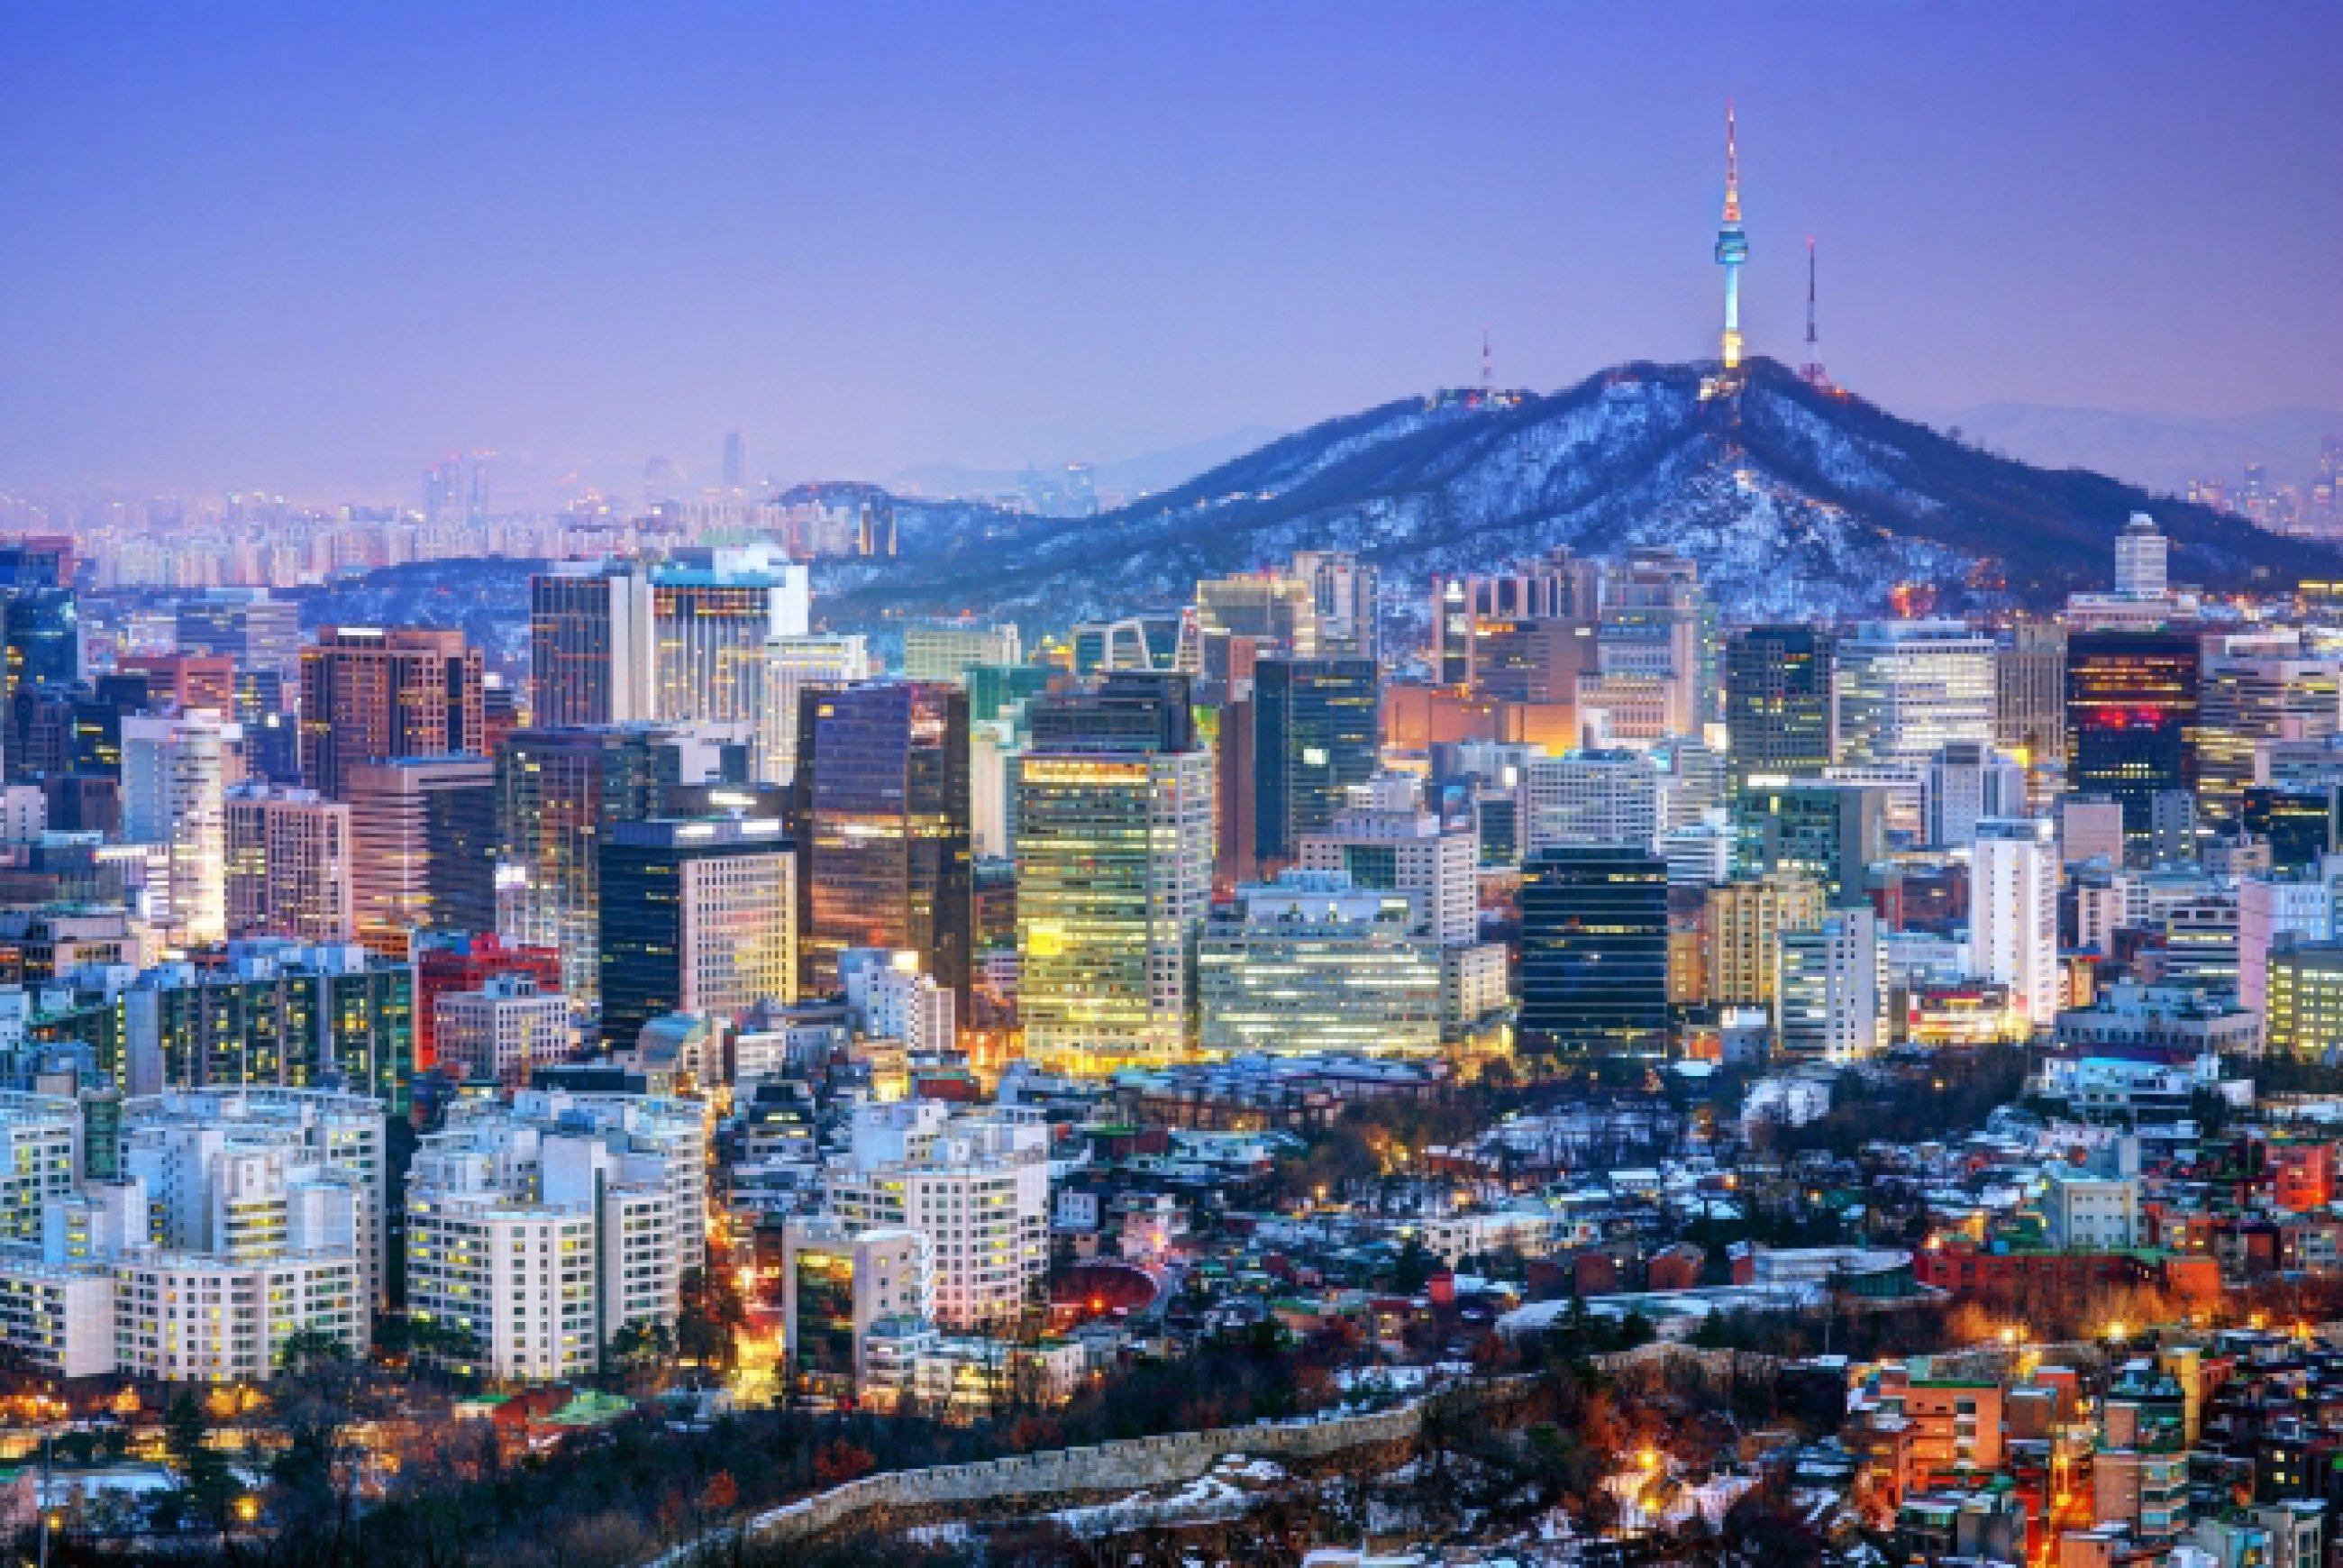 https://bubo.sk/uploads/galleries/7452/downtown-cityscape-of-seoul-south-korea.jpg